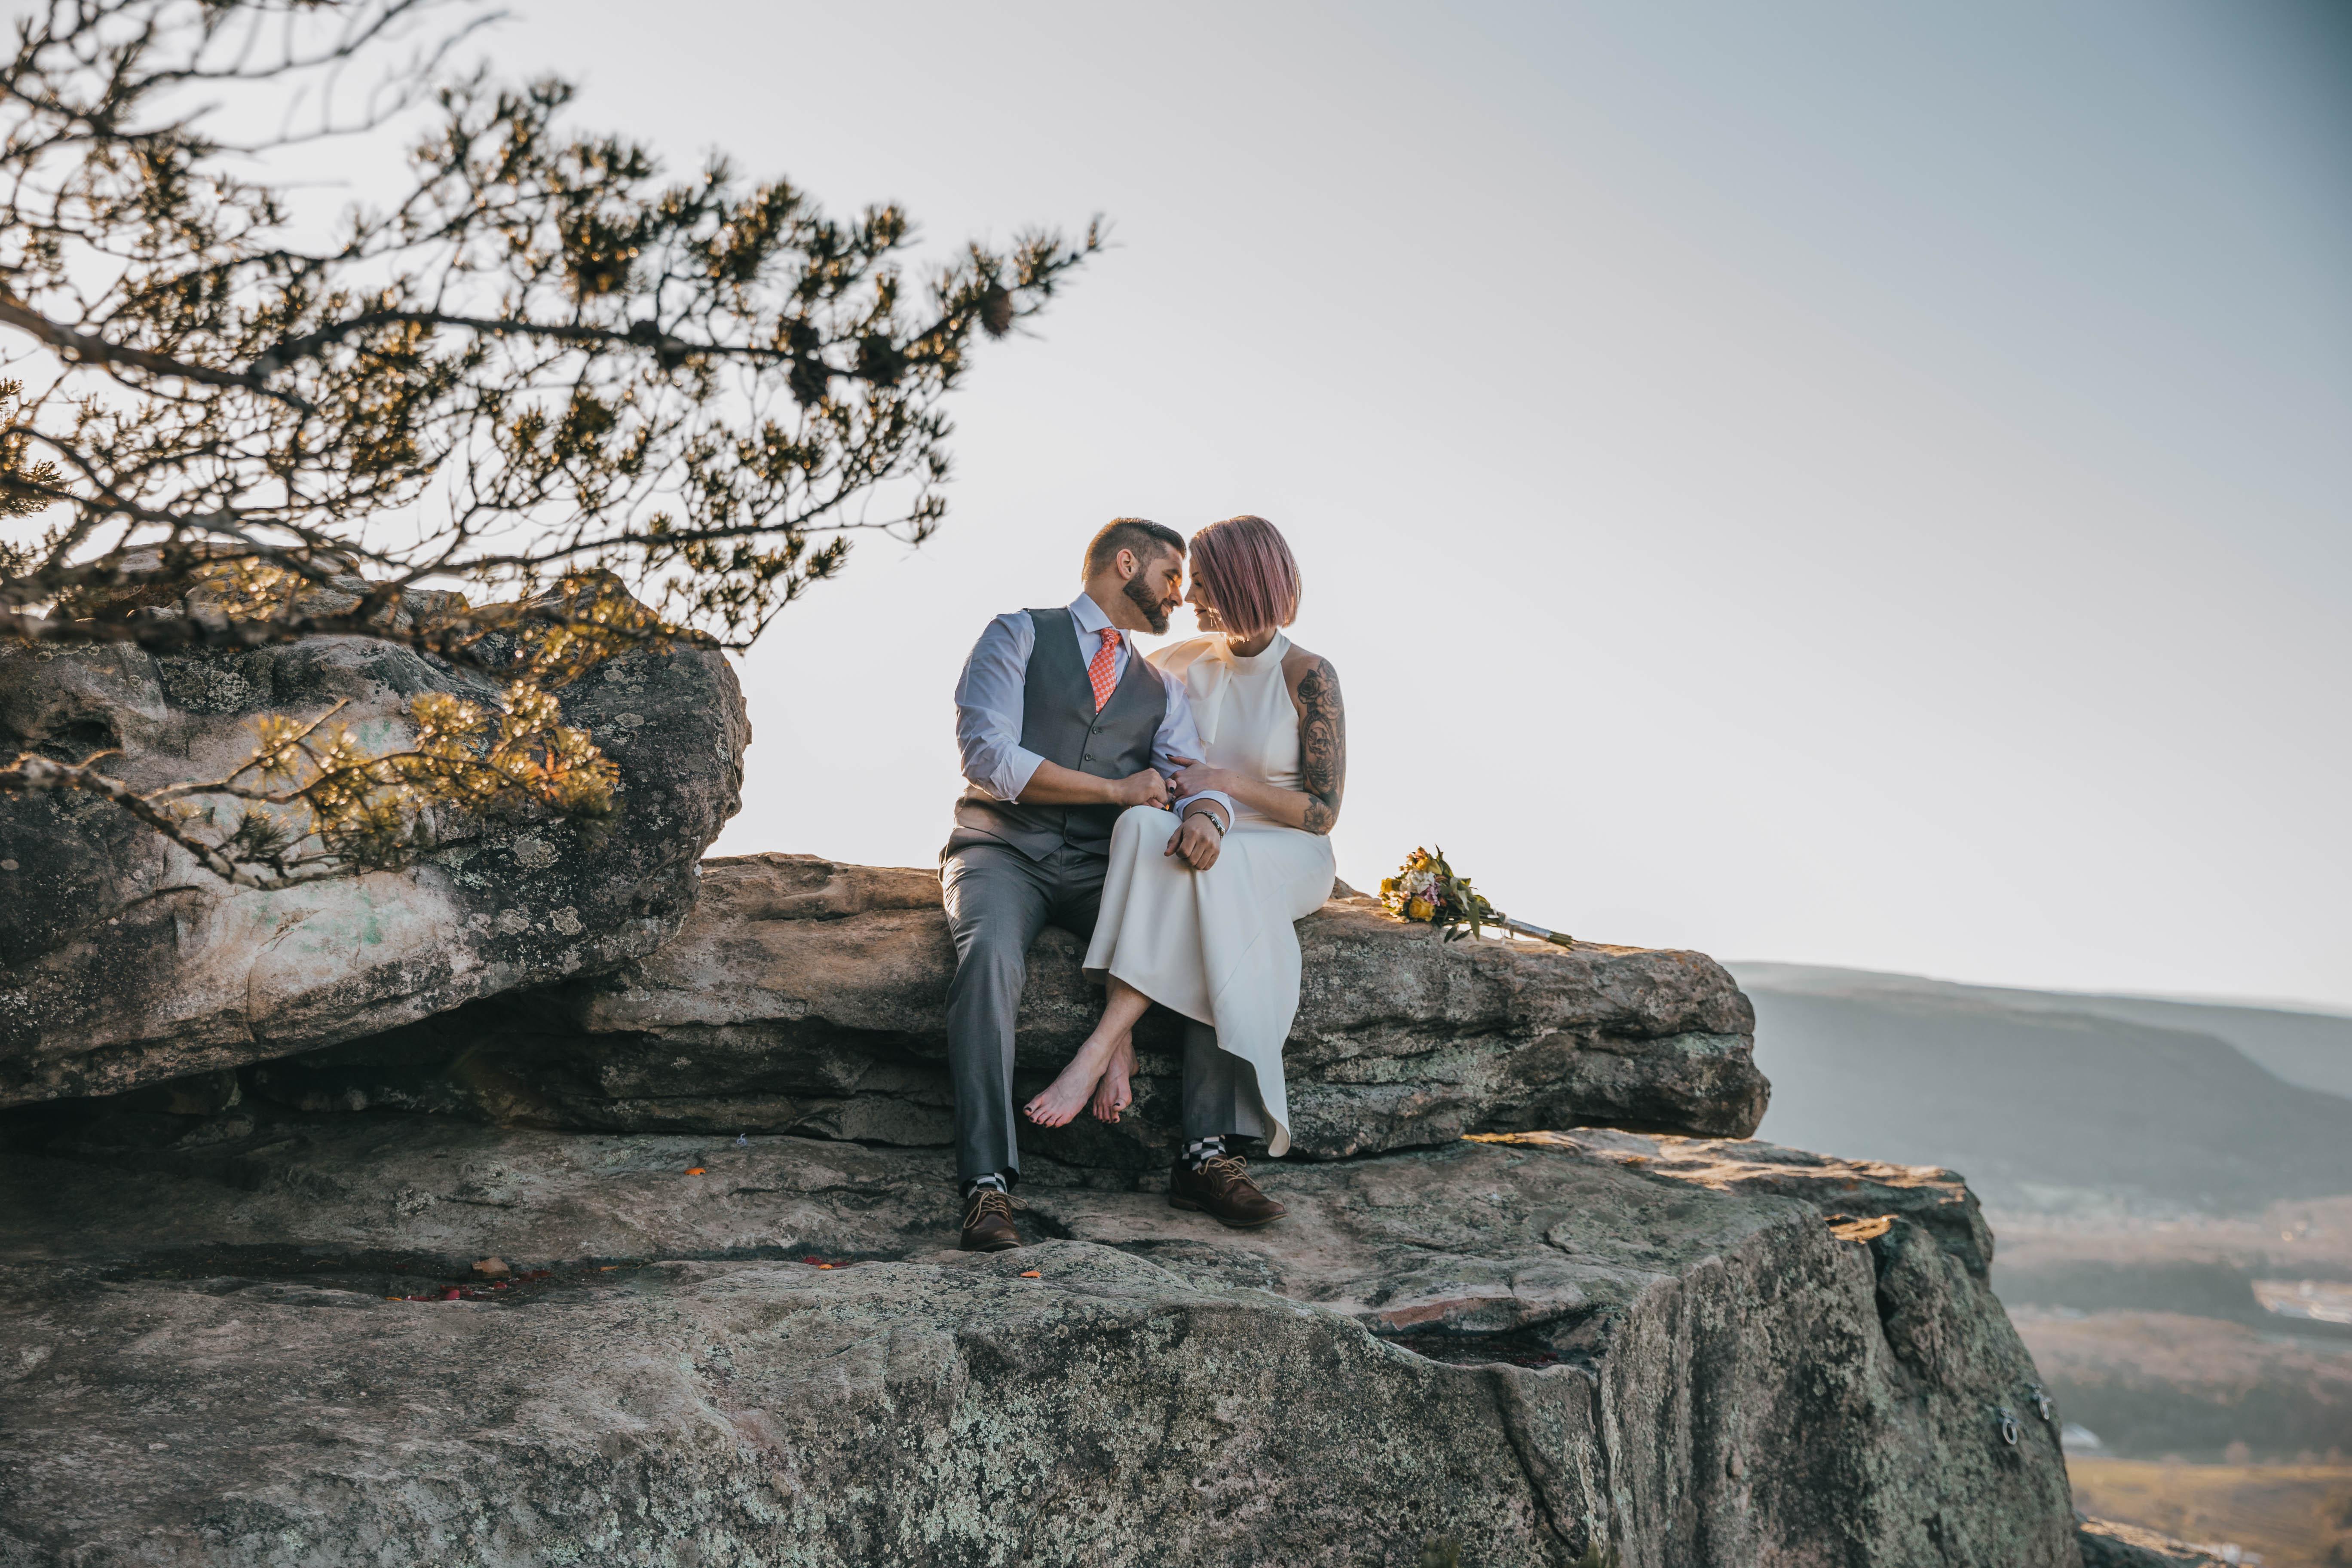 Elopement / Destination Wedding Package